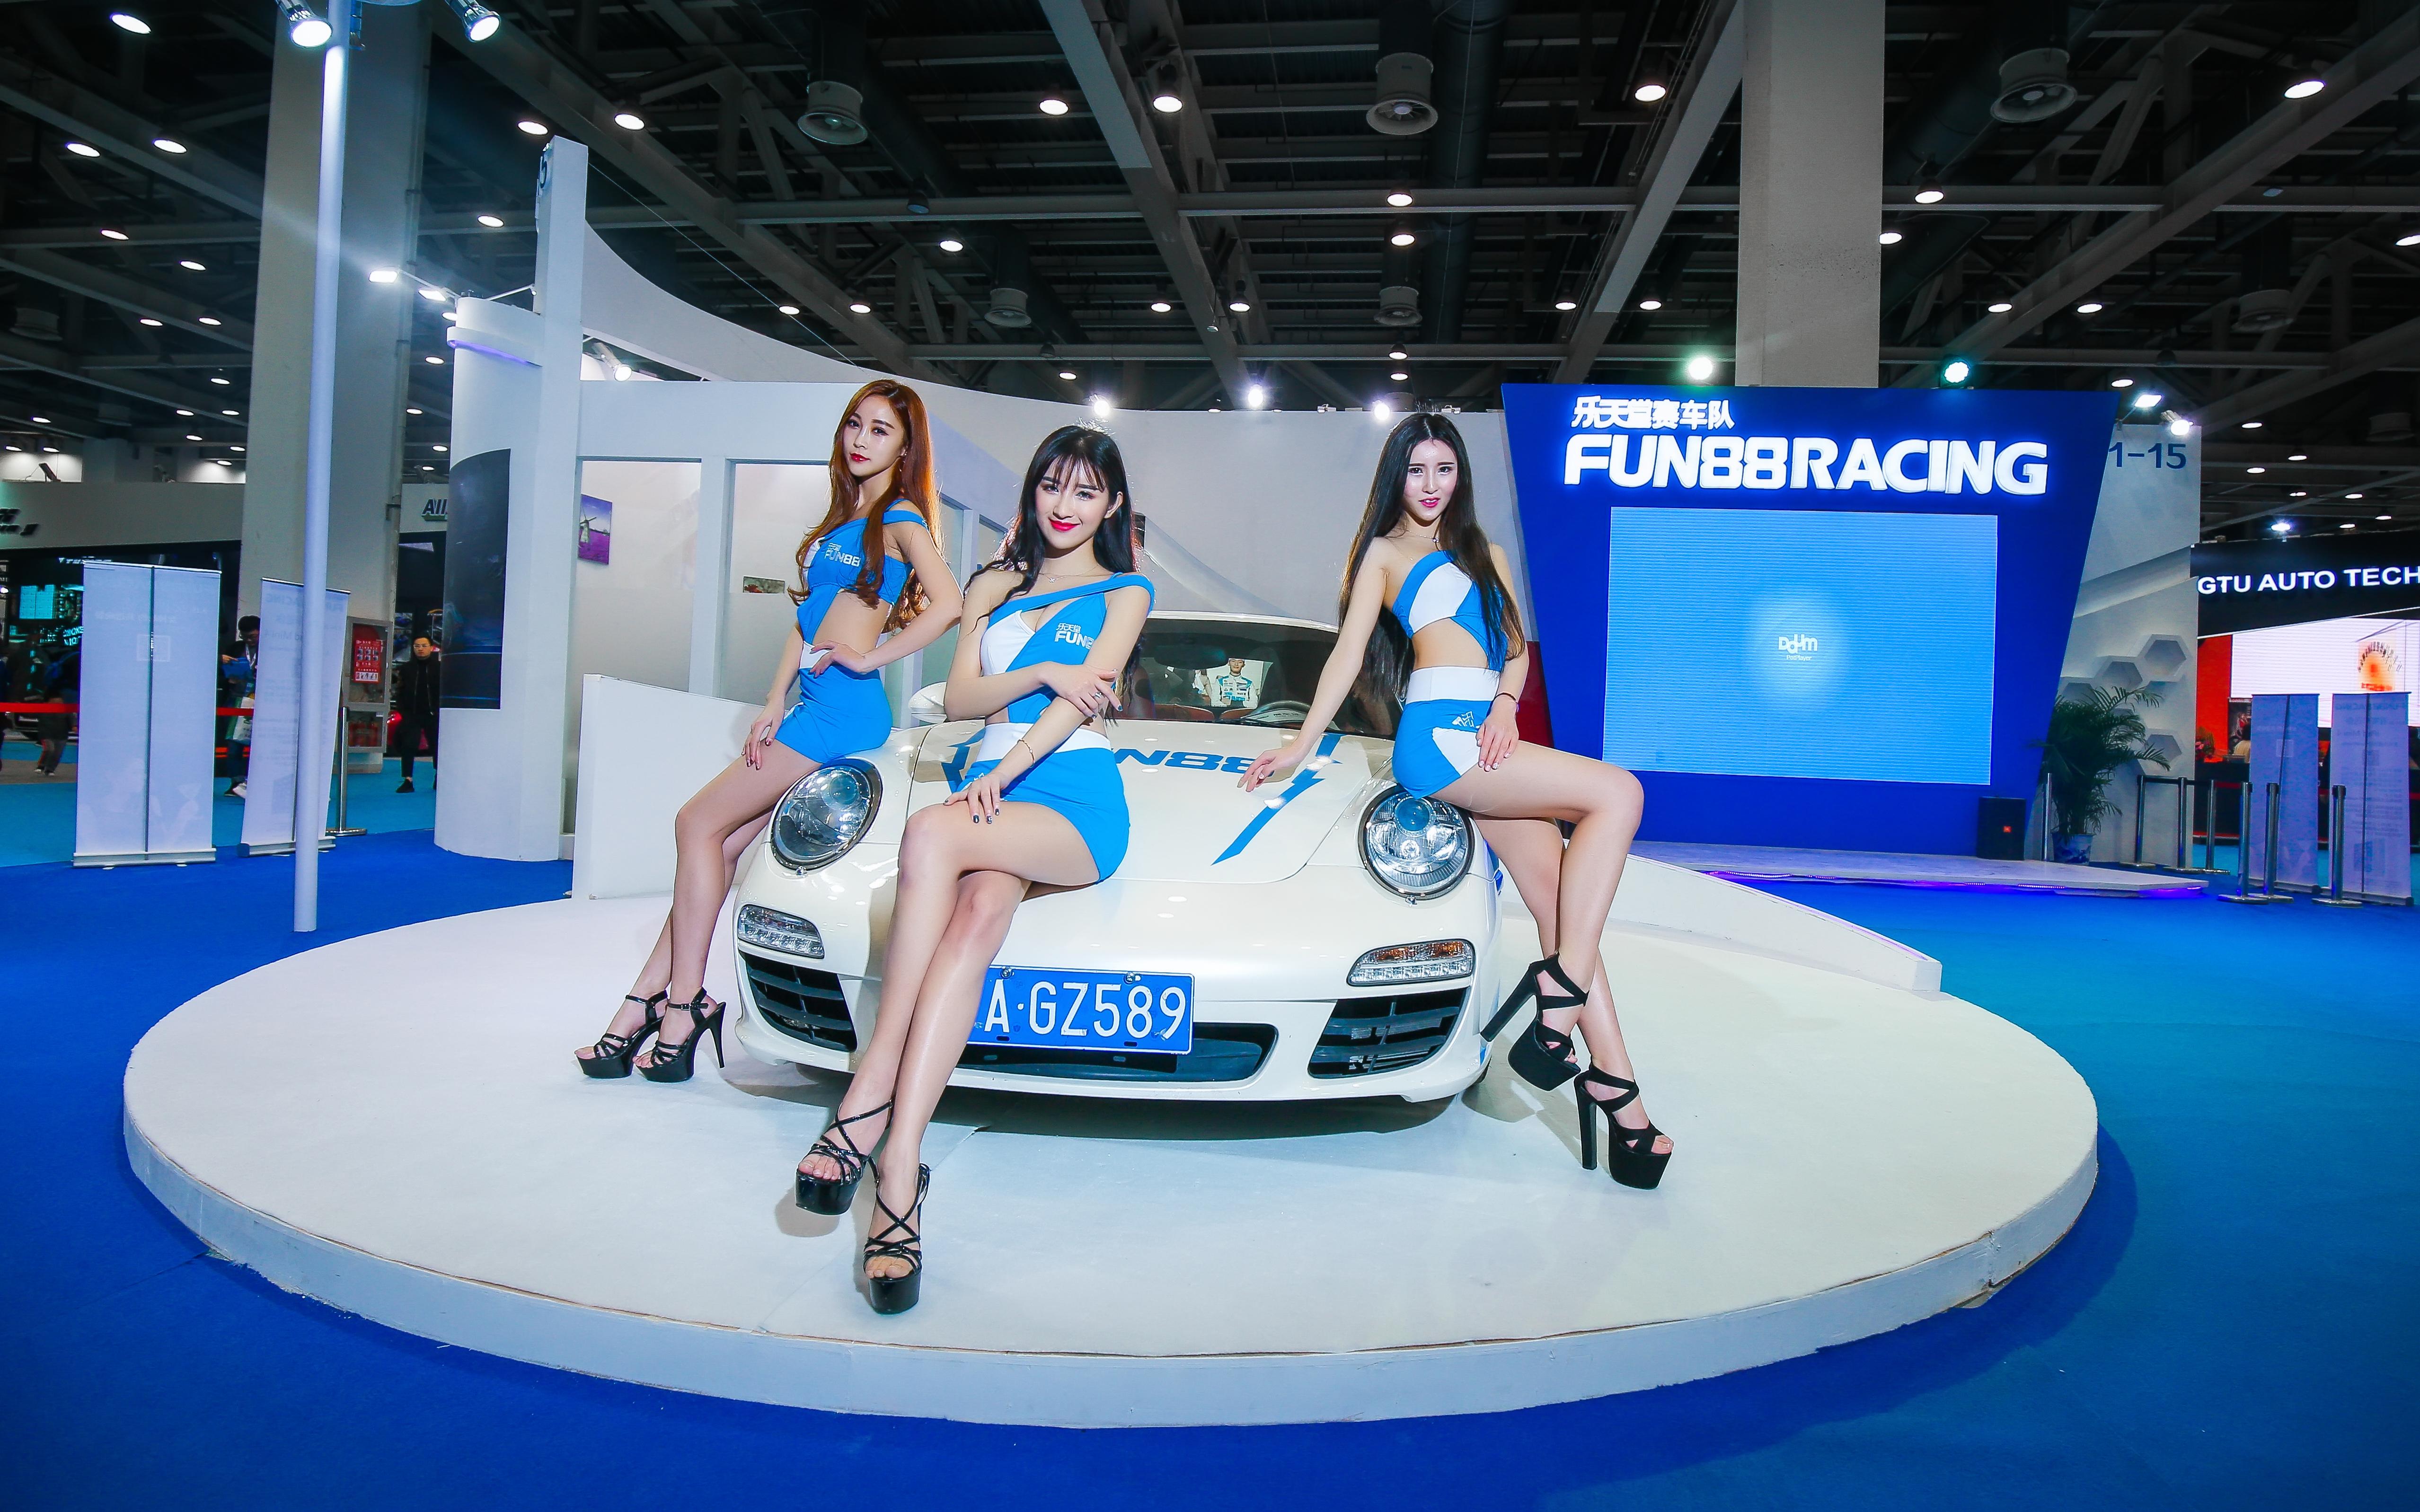 FUN88 x Porsche GT Show 01